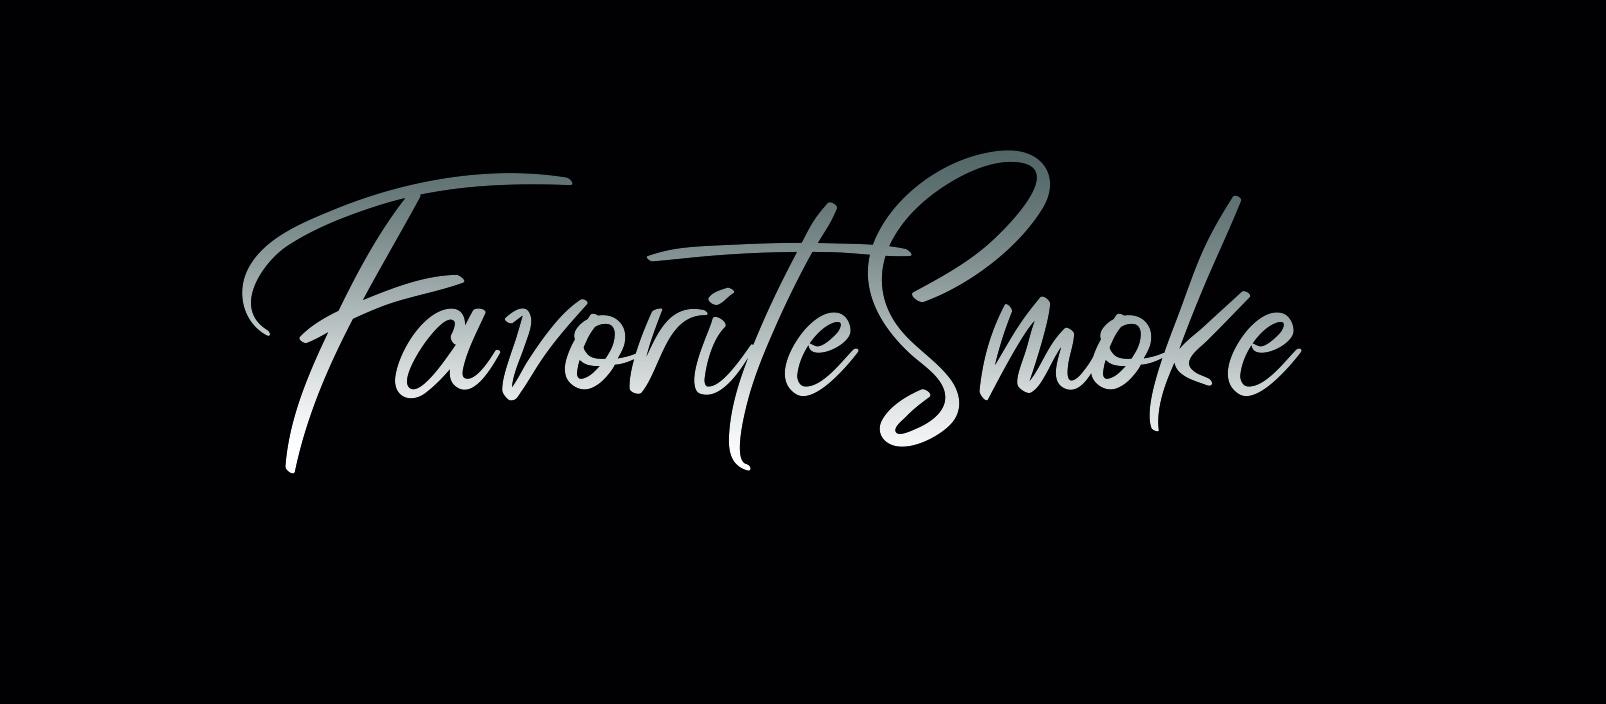 Favorite Smoke